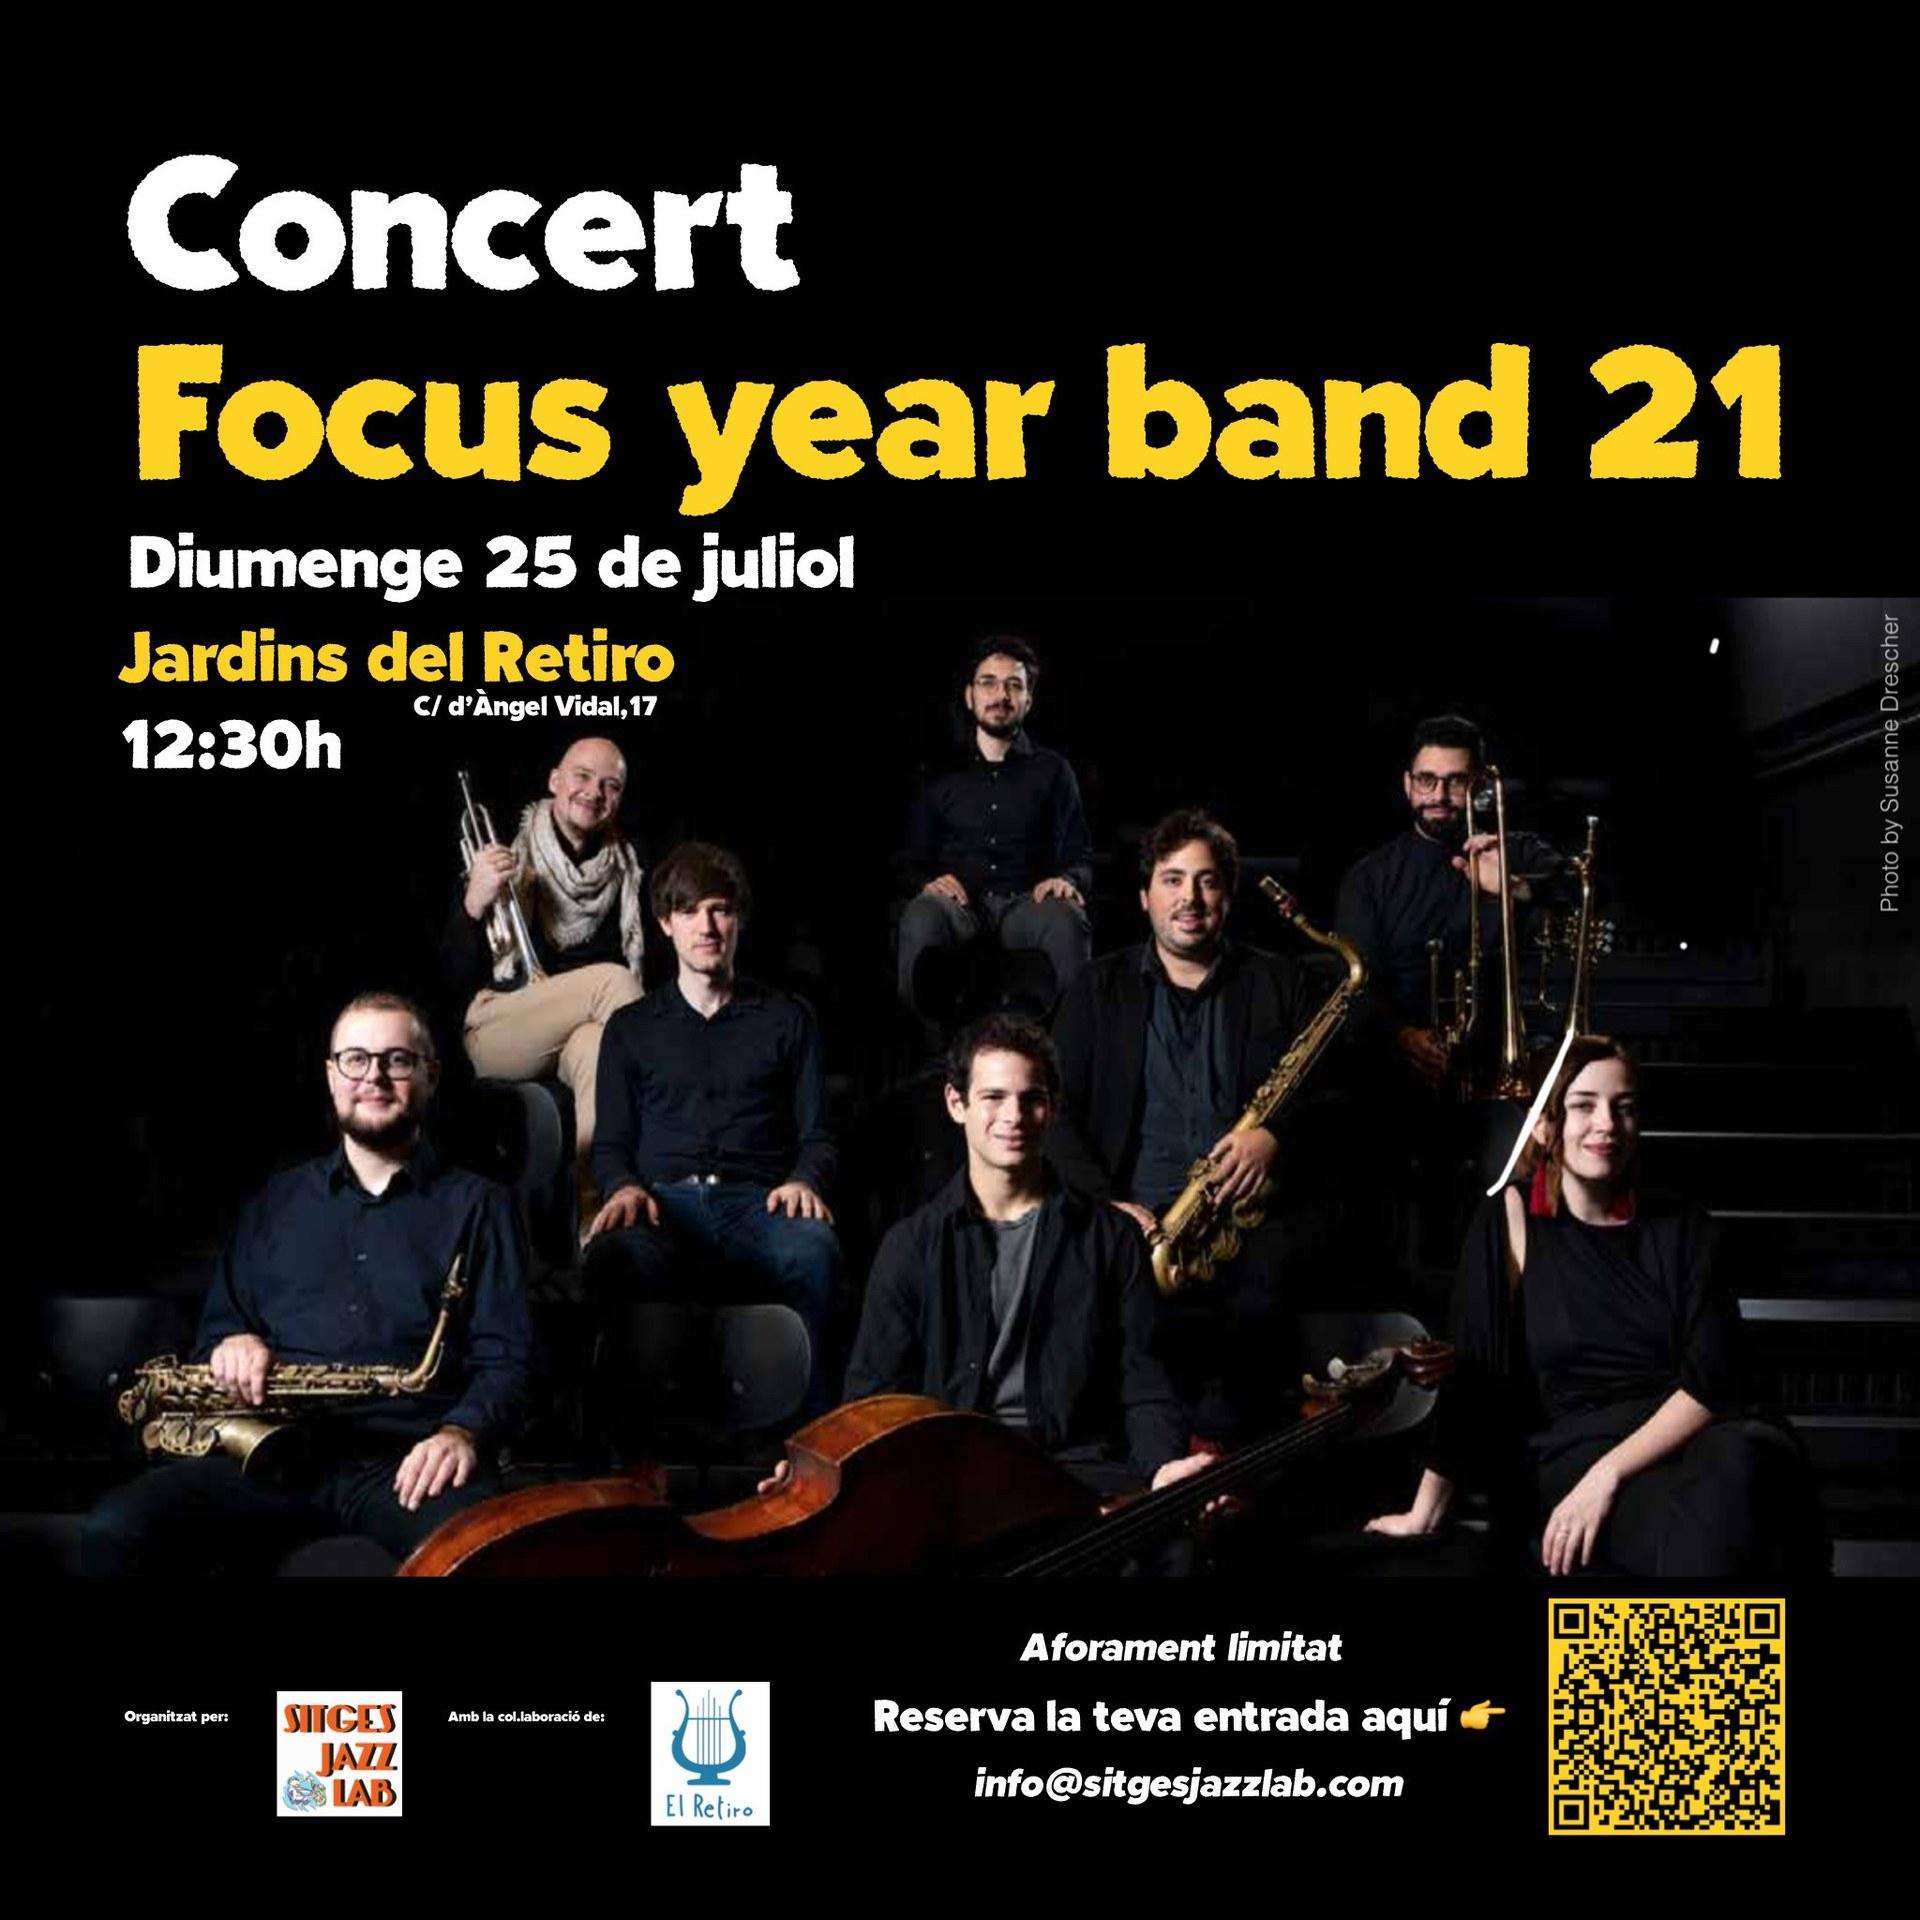 Concert de THE FOCUS YEAR BAND 21